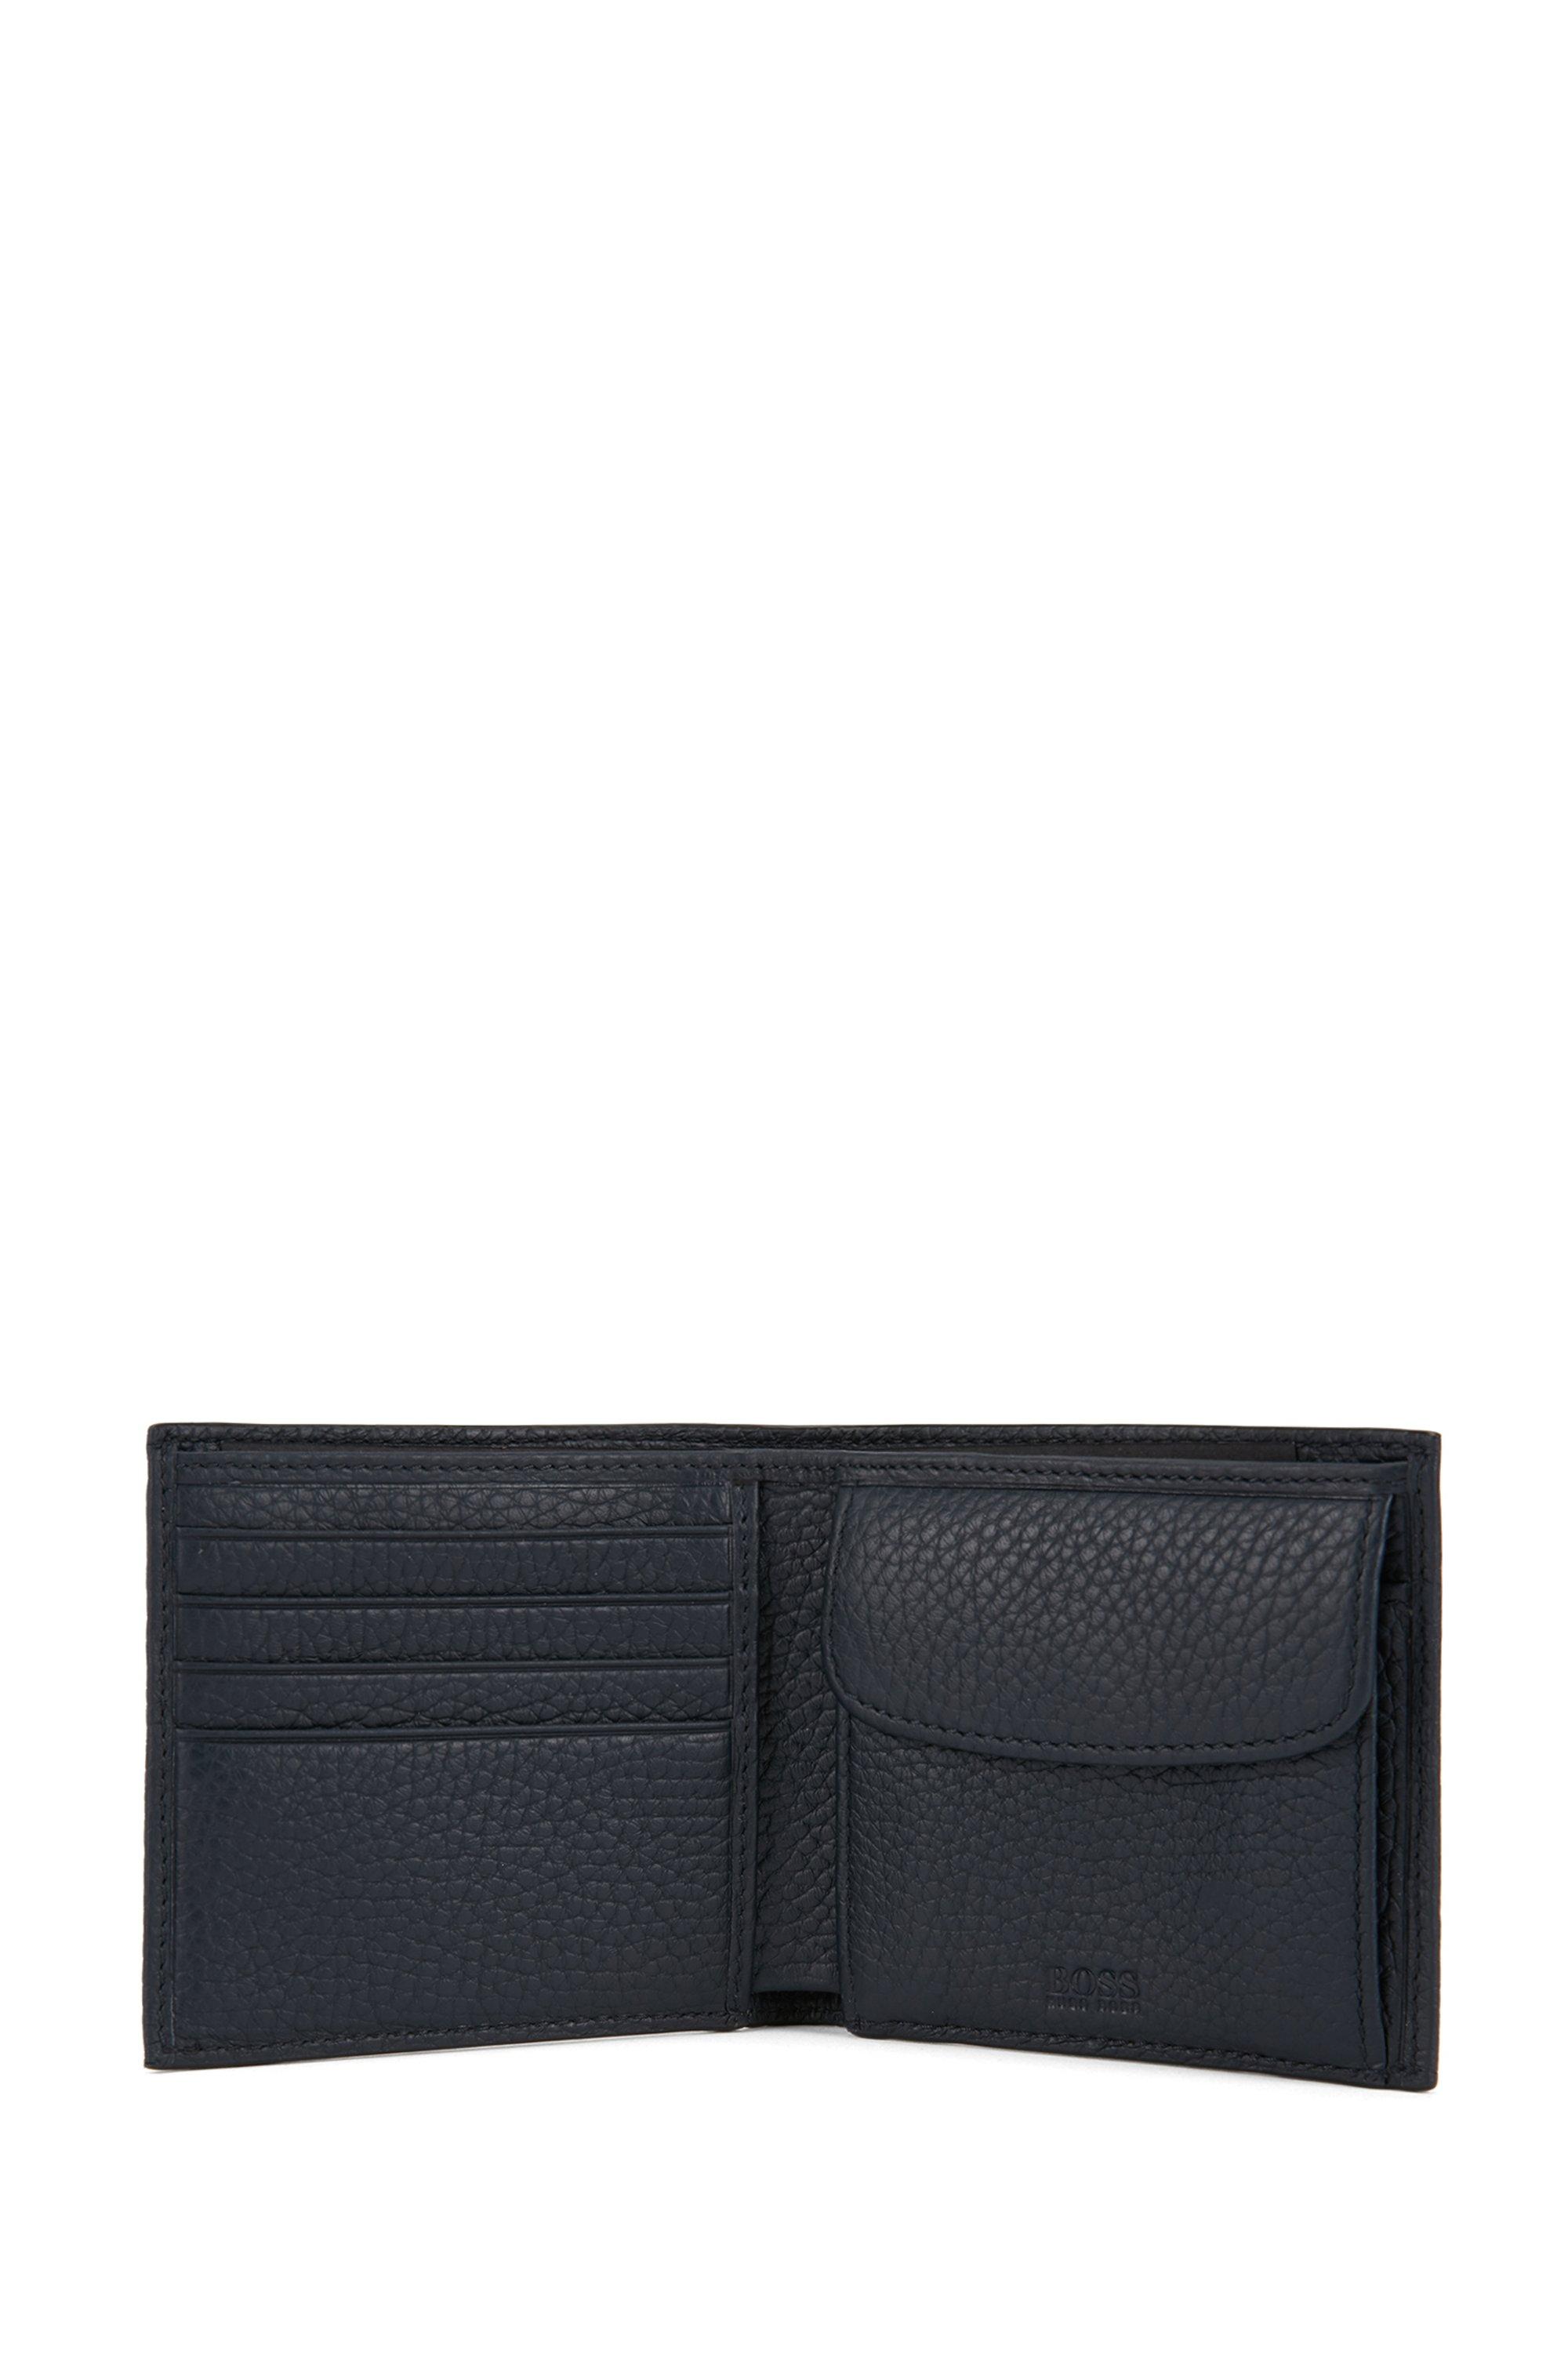 Italian-leather billfold wallet with large grain